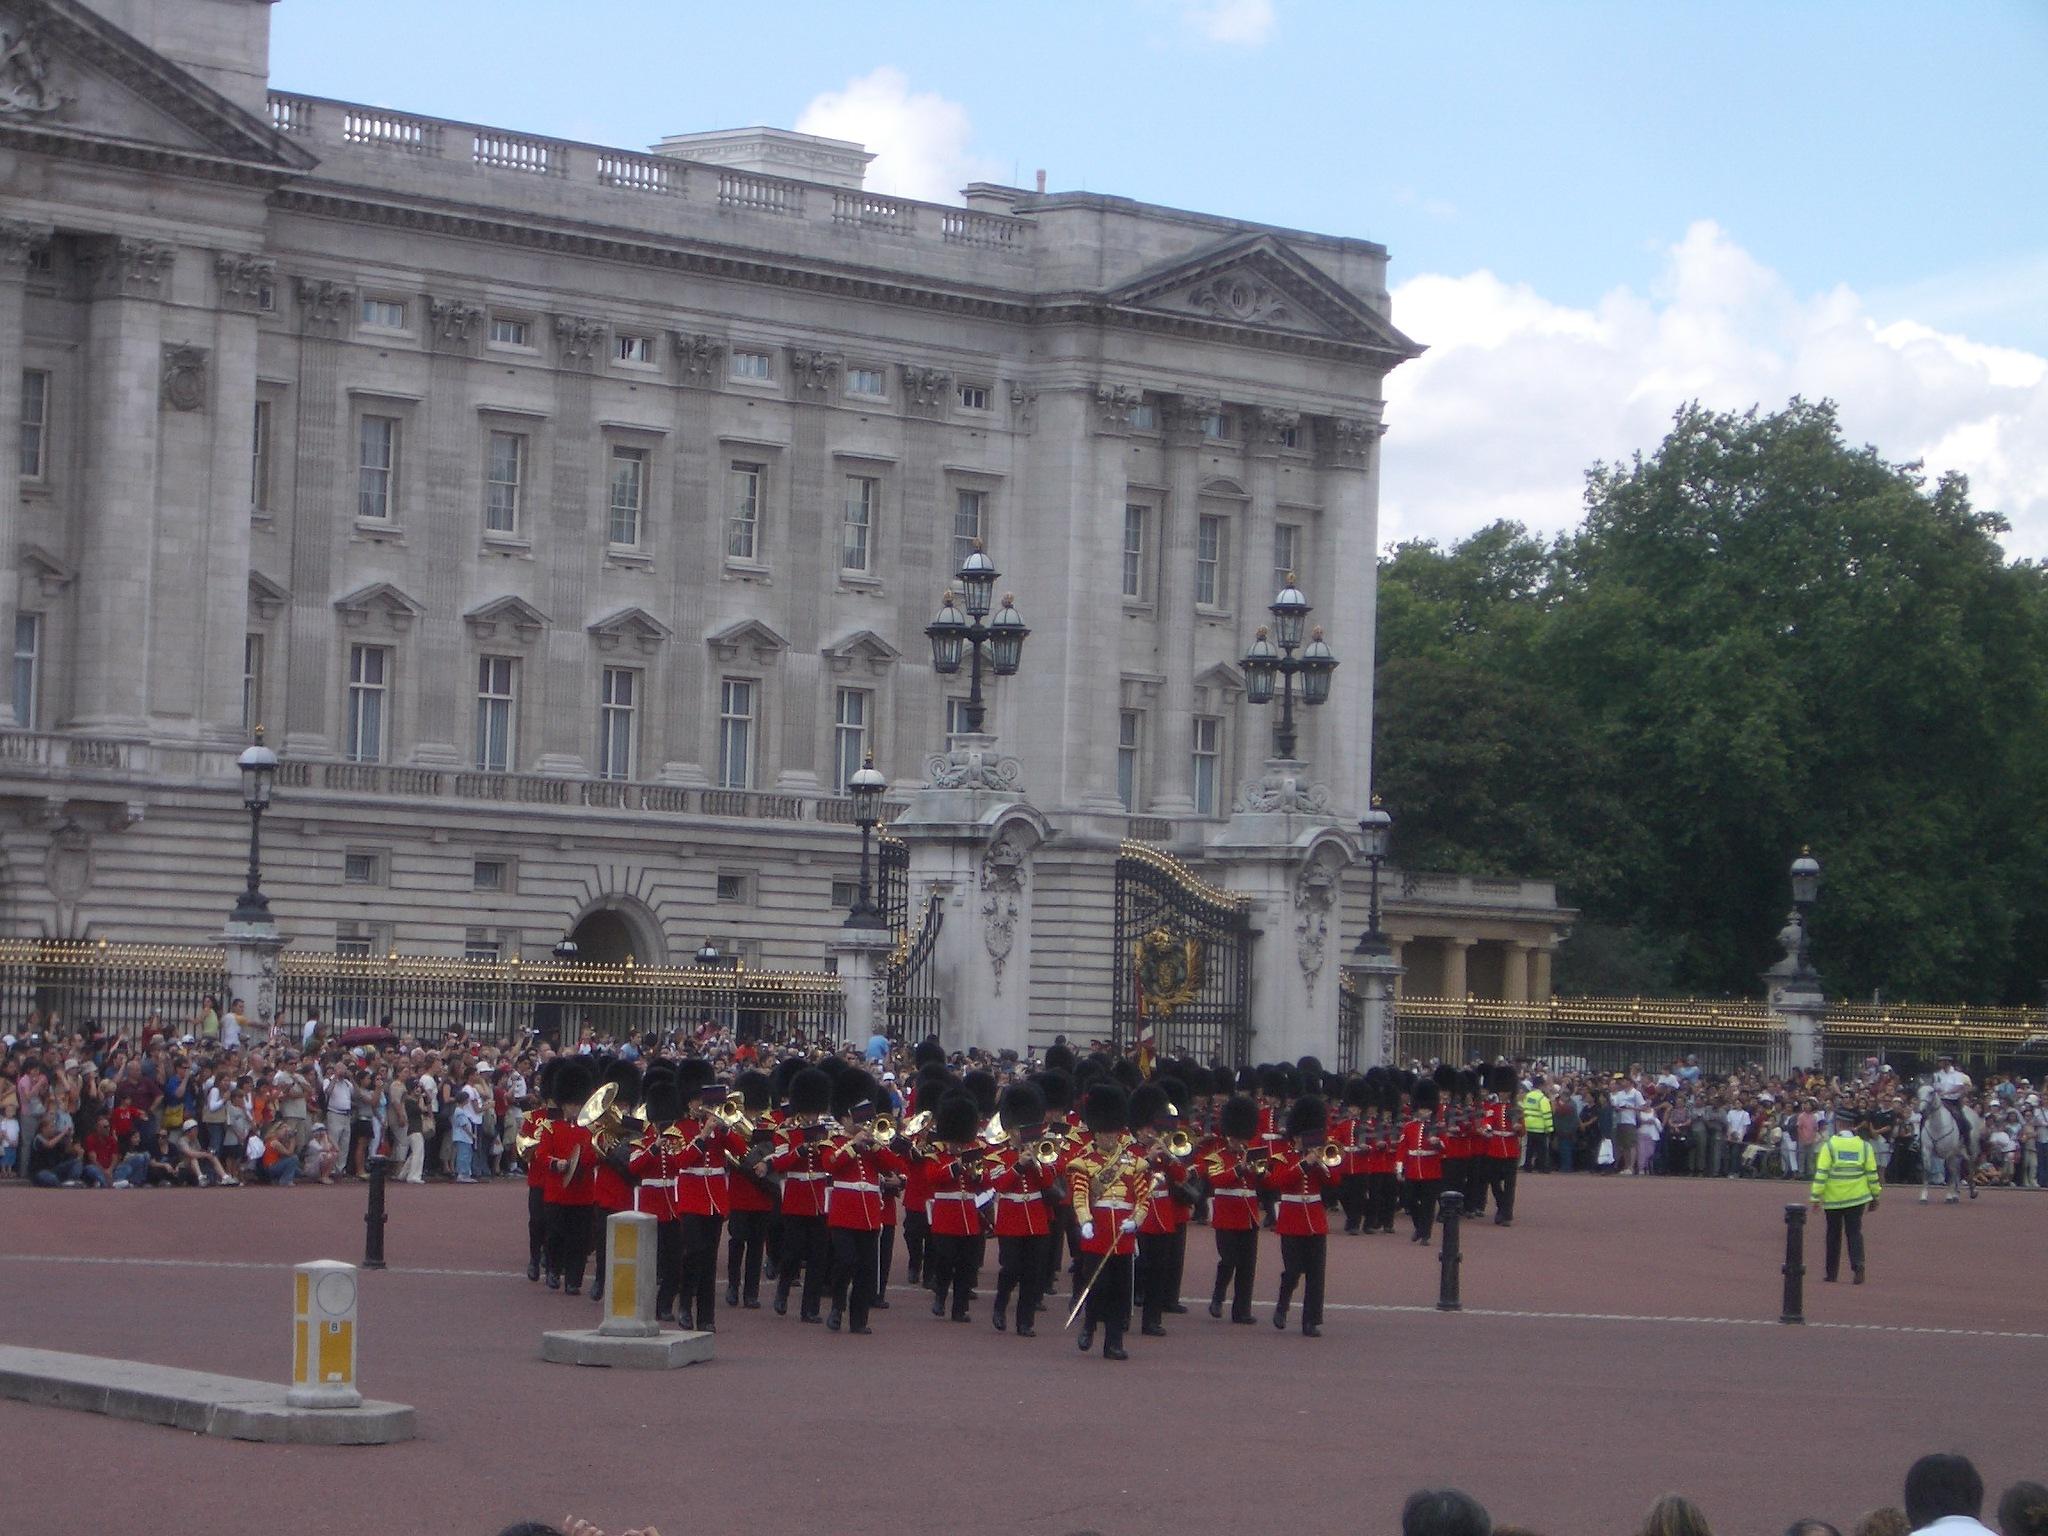 Buckingham Palace by Nathaniel Smelser